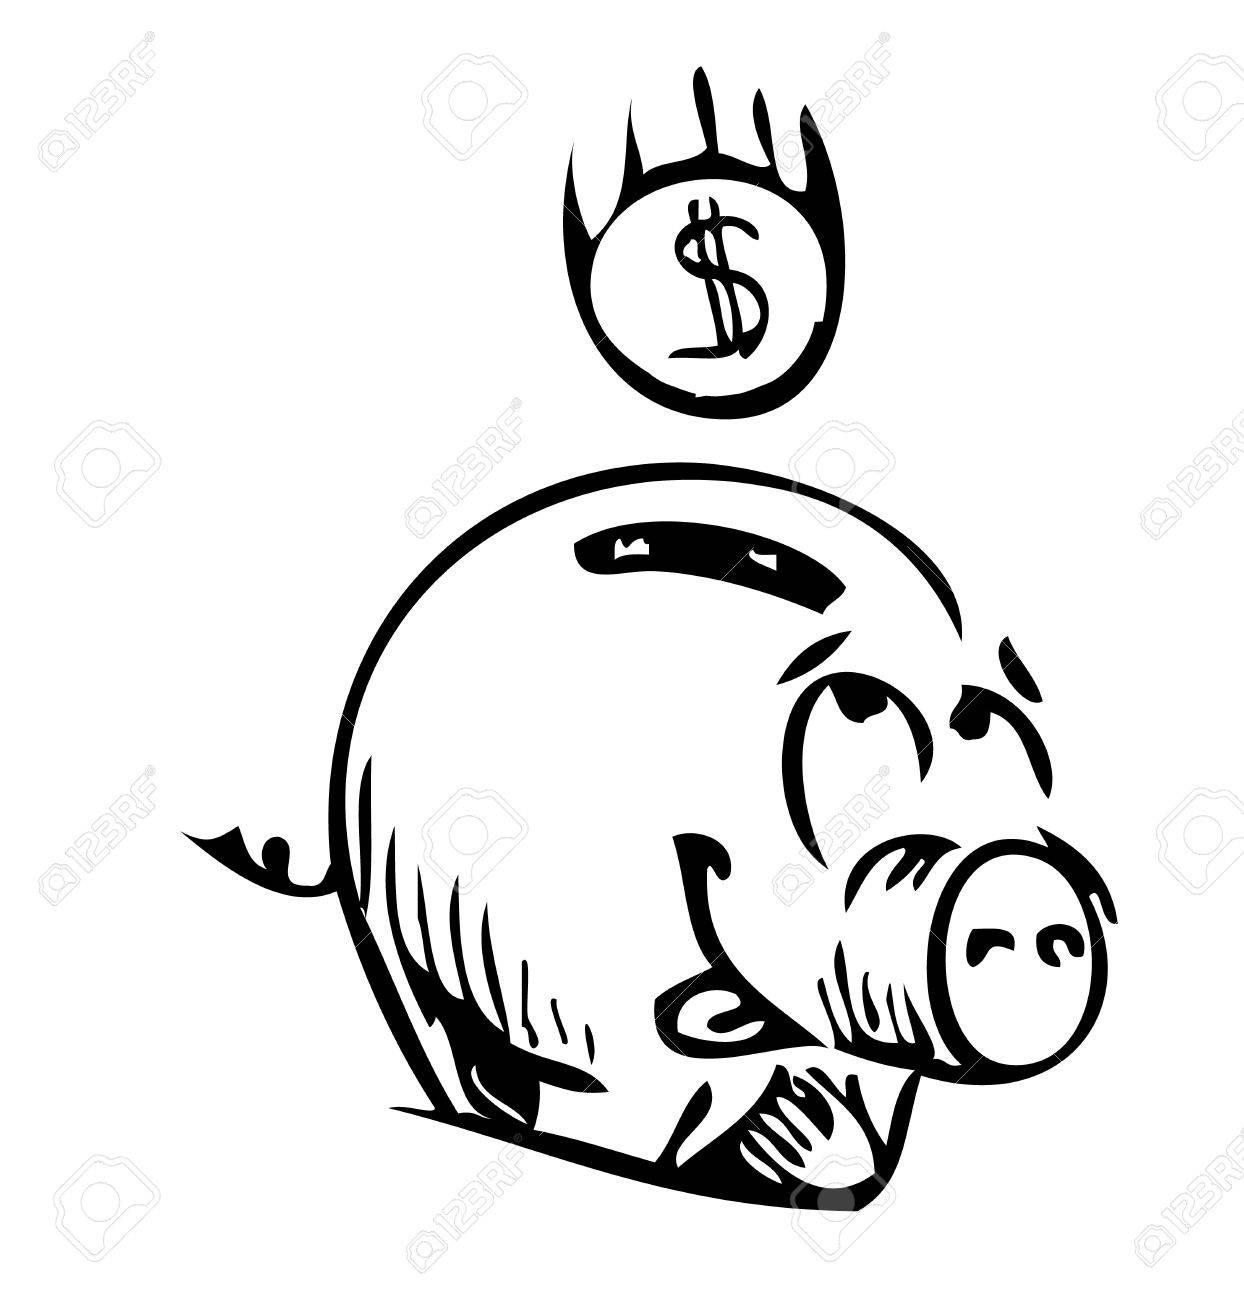 1244x1300 Money Cartoon Pig Money Box Sketch Icon Royalty Free Cliparts